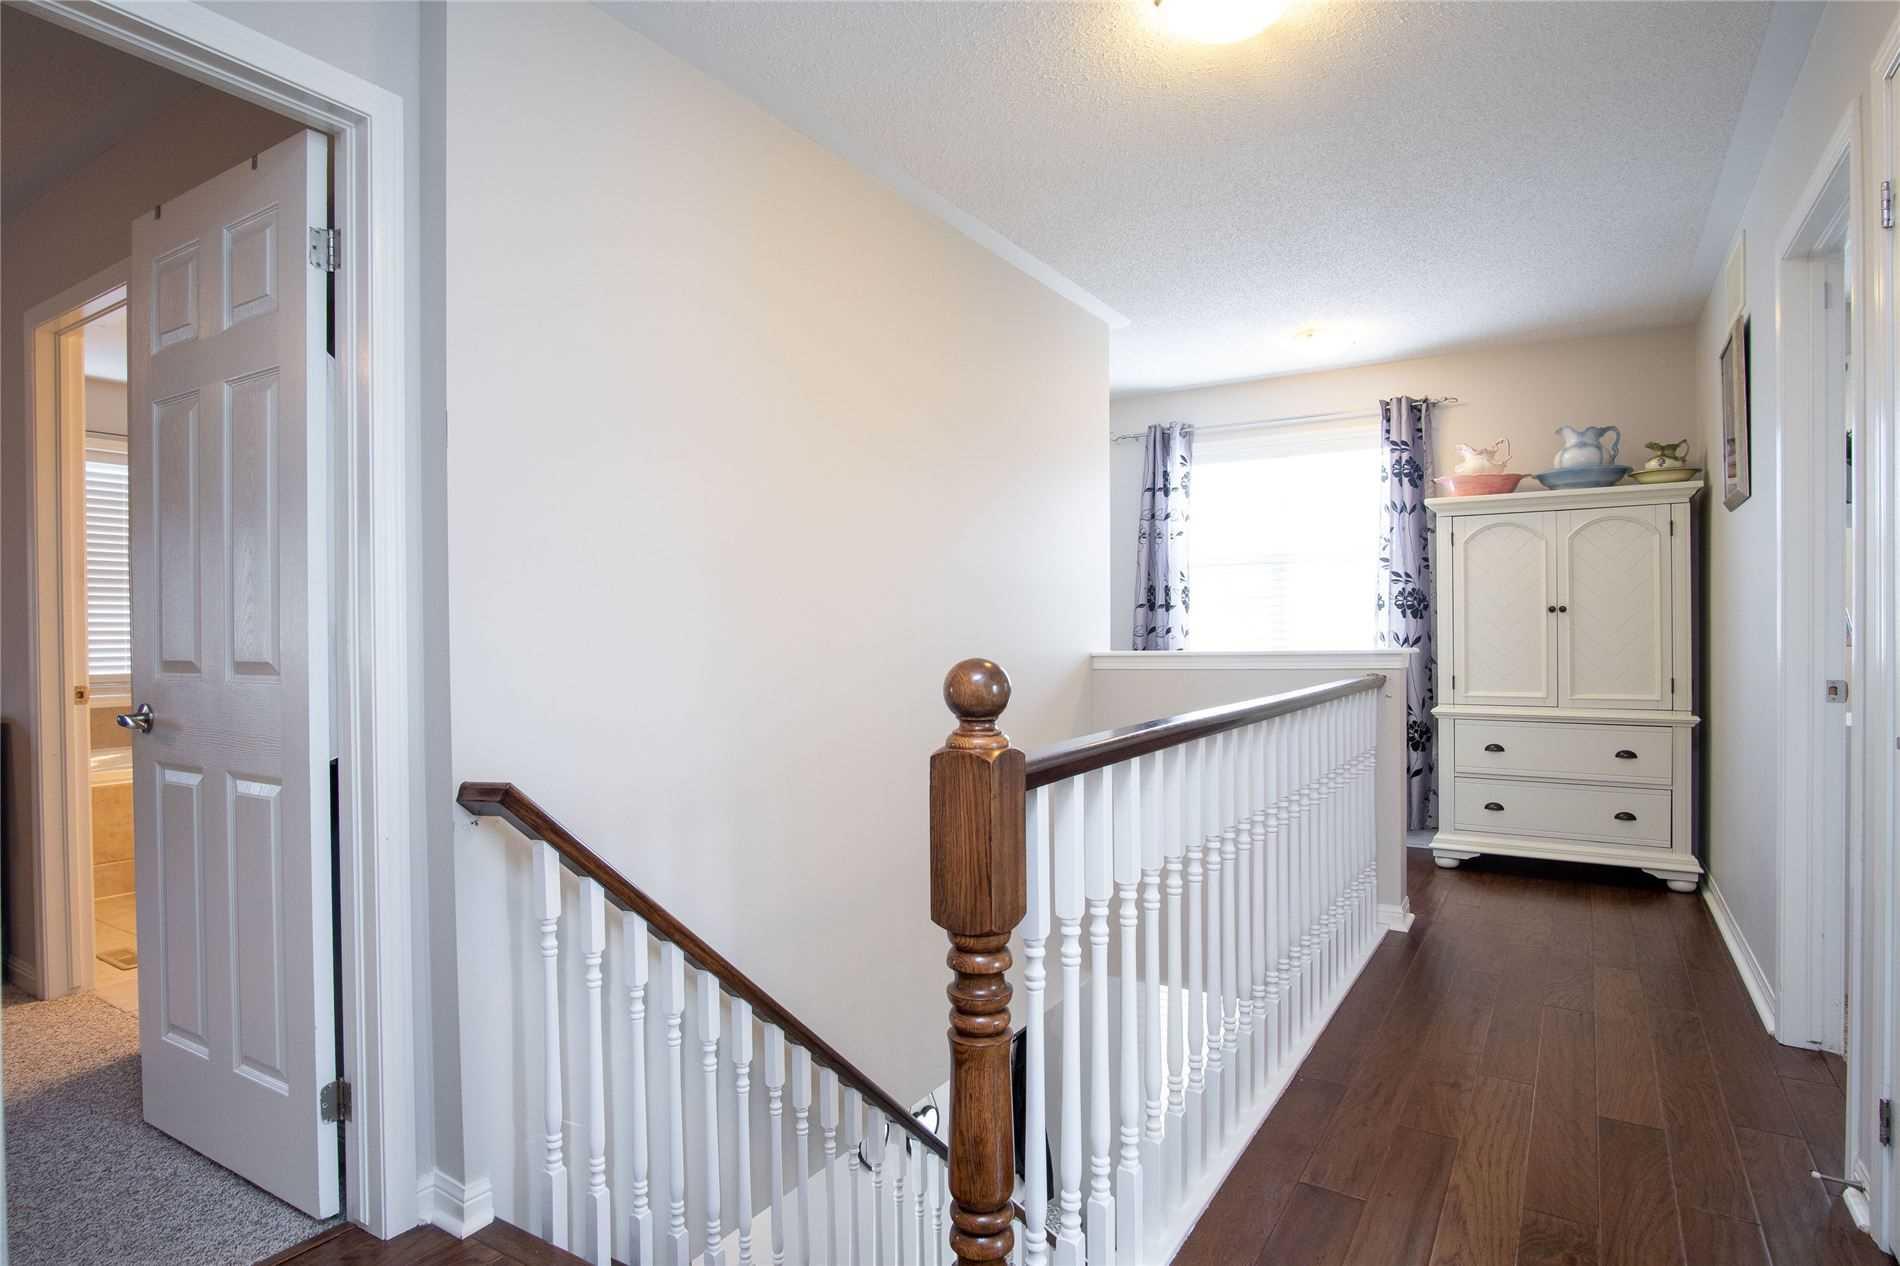 827 Biggar Hts - Coates Detached for sale, 4 Bedrooms (W5400280) - #16